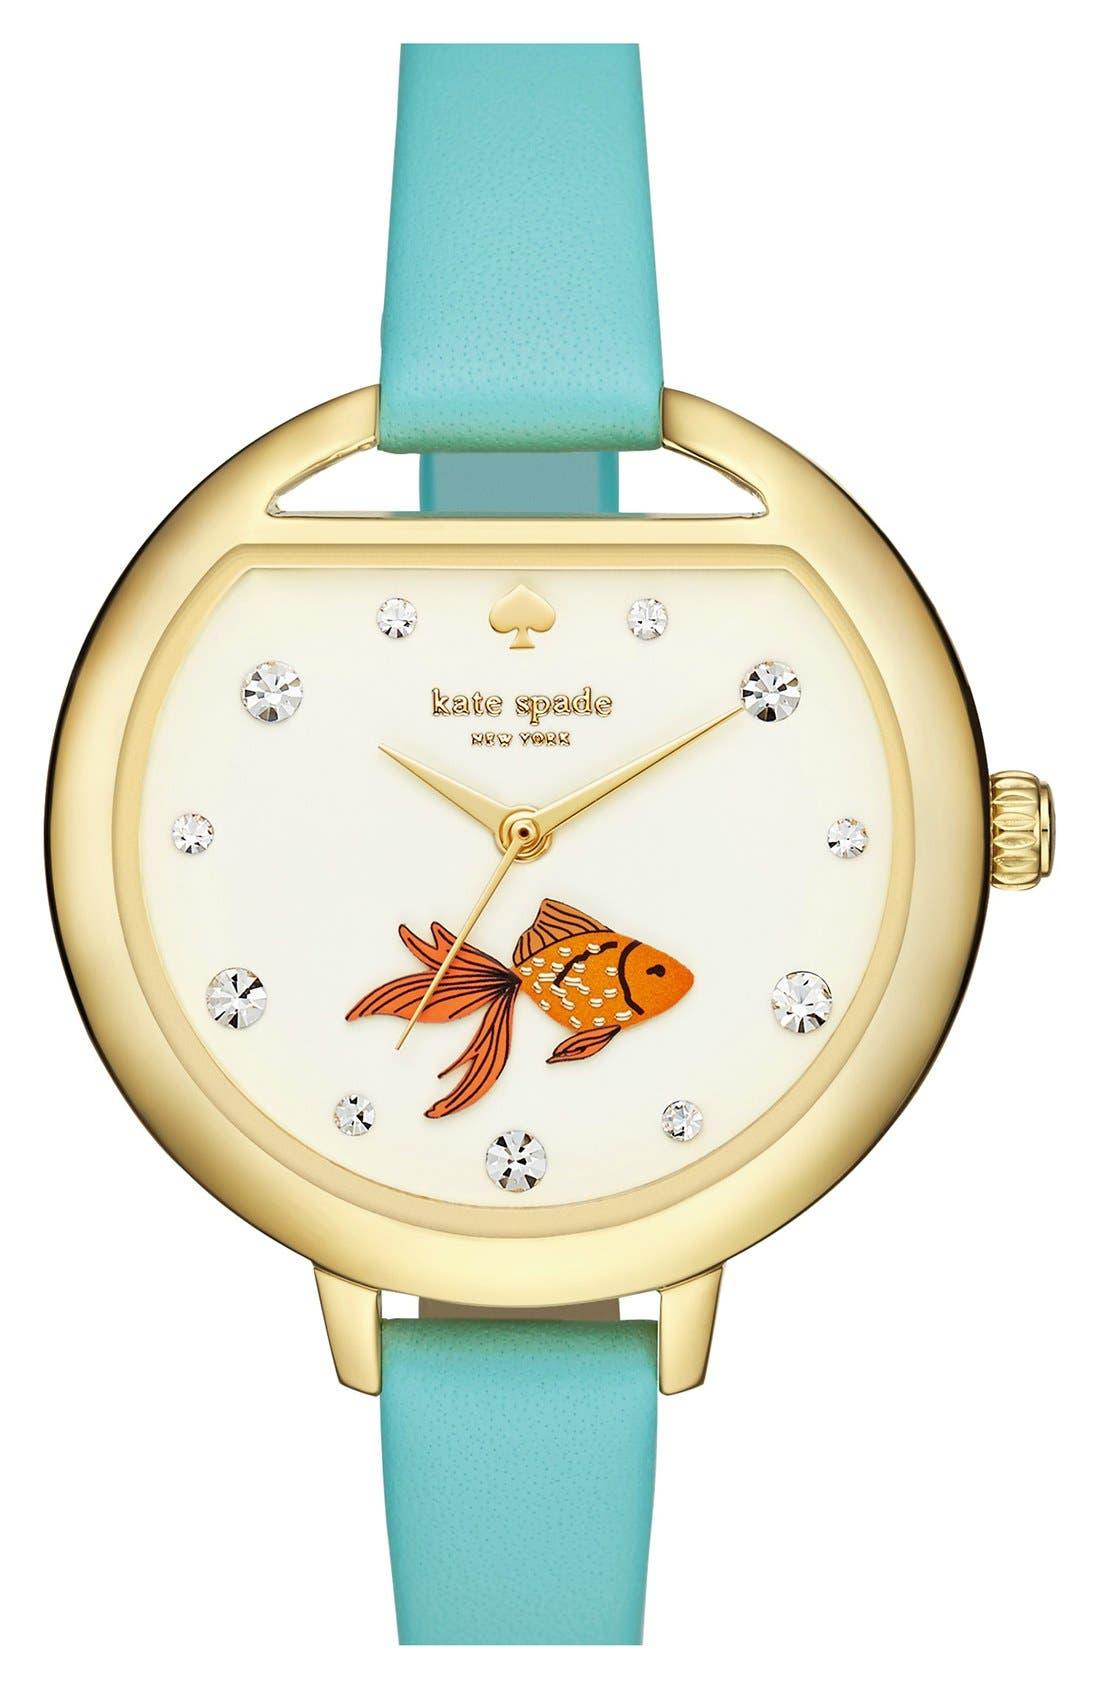 Main Image - kate spade new york 'metro - fishbowl' leather strap watch, 34mm